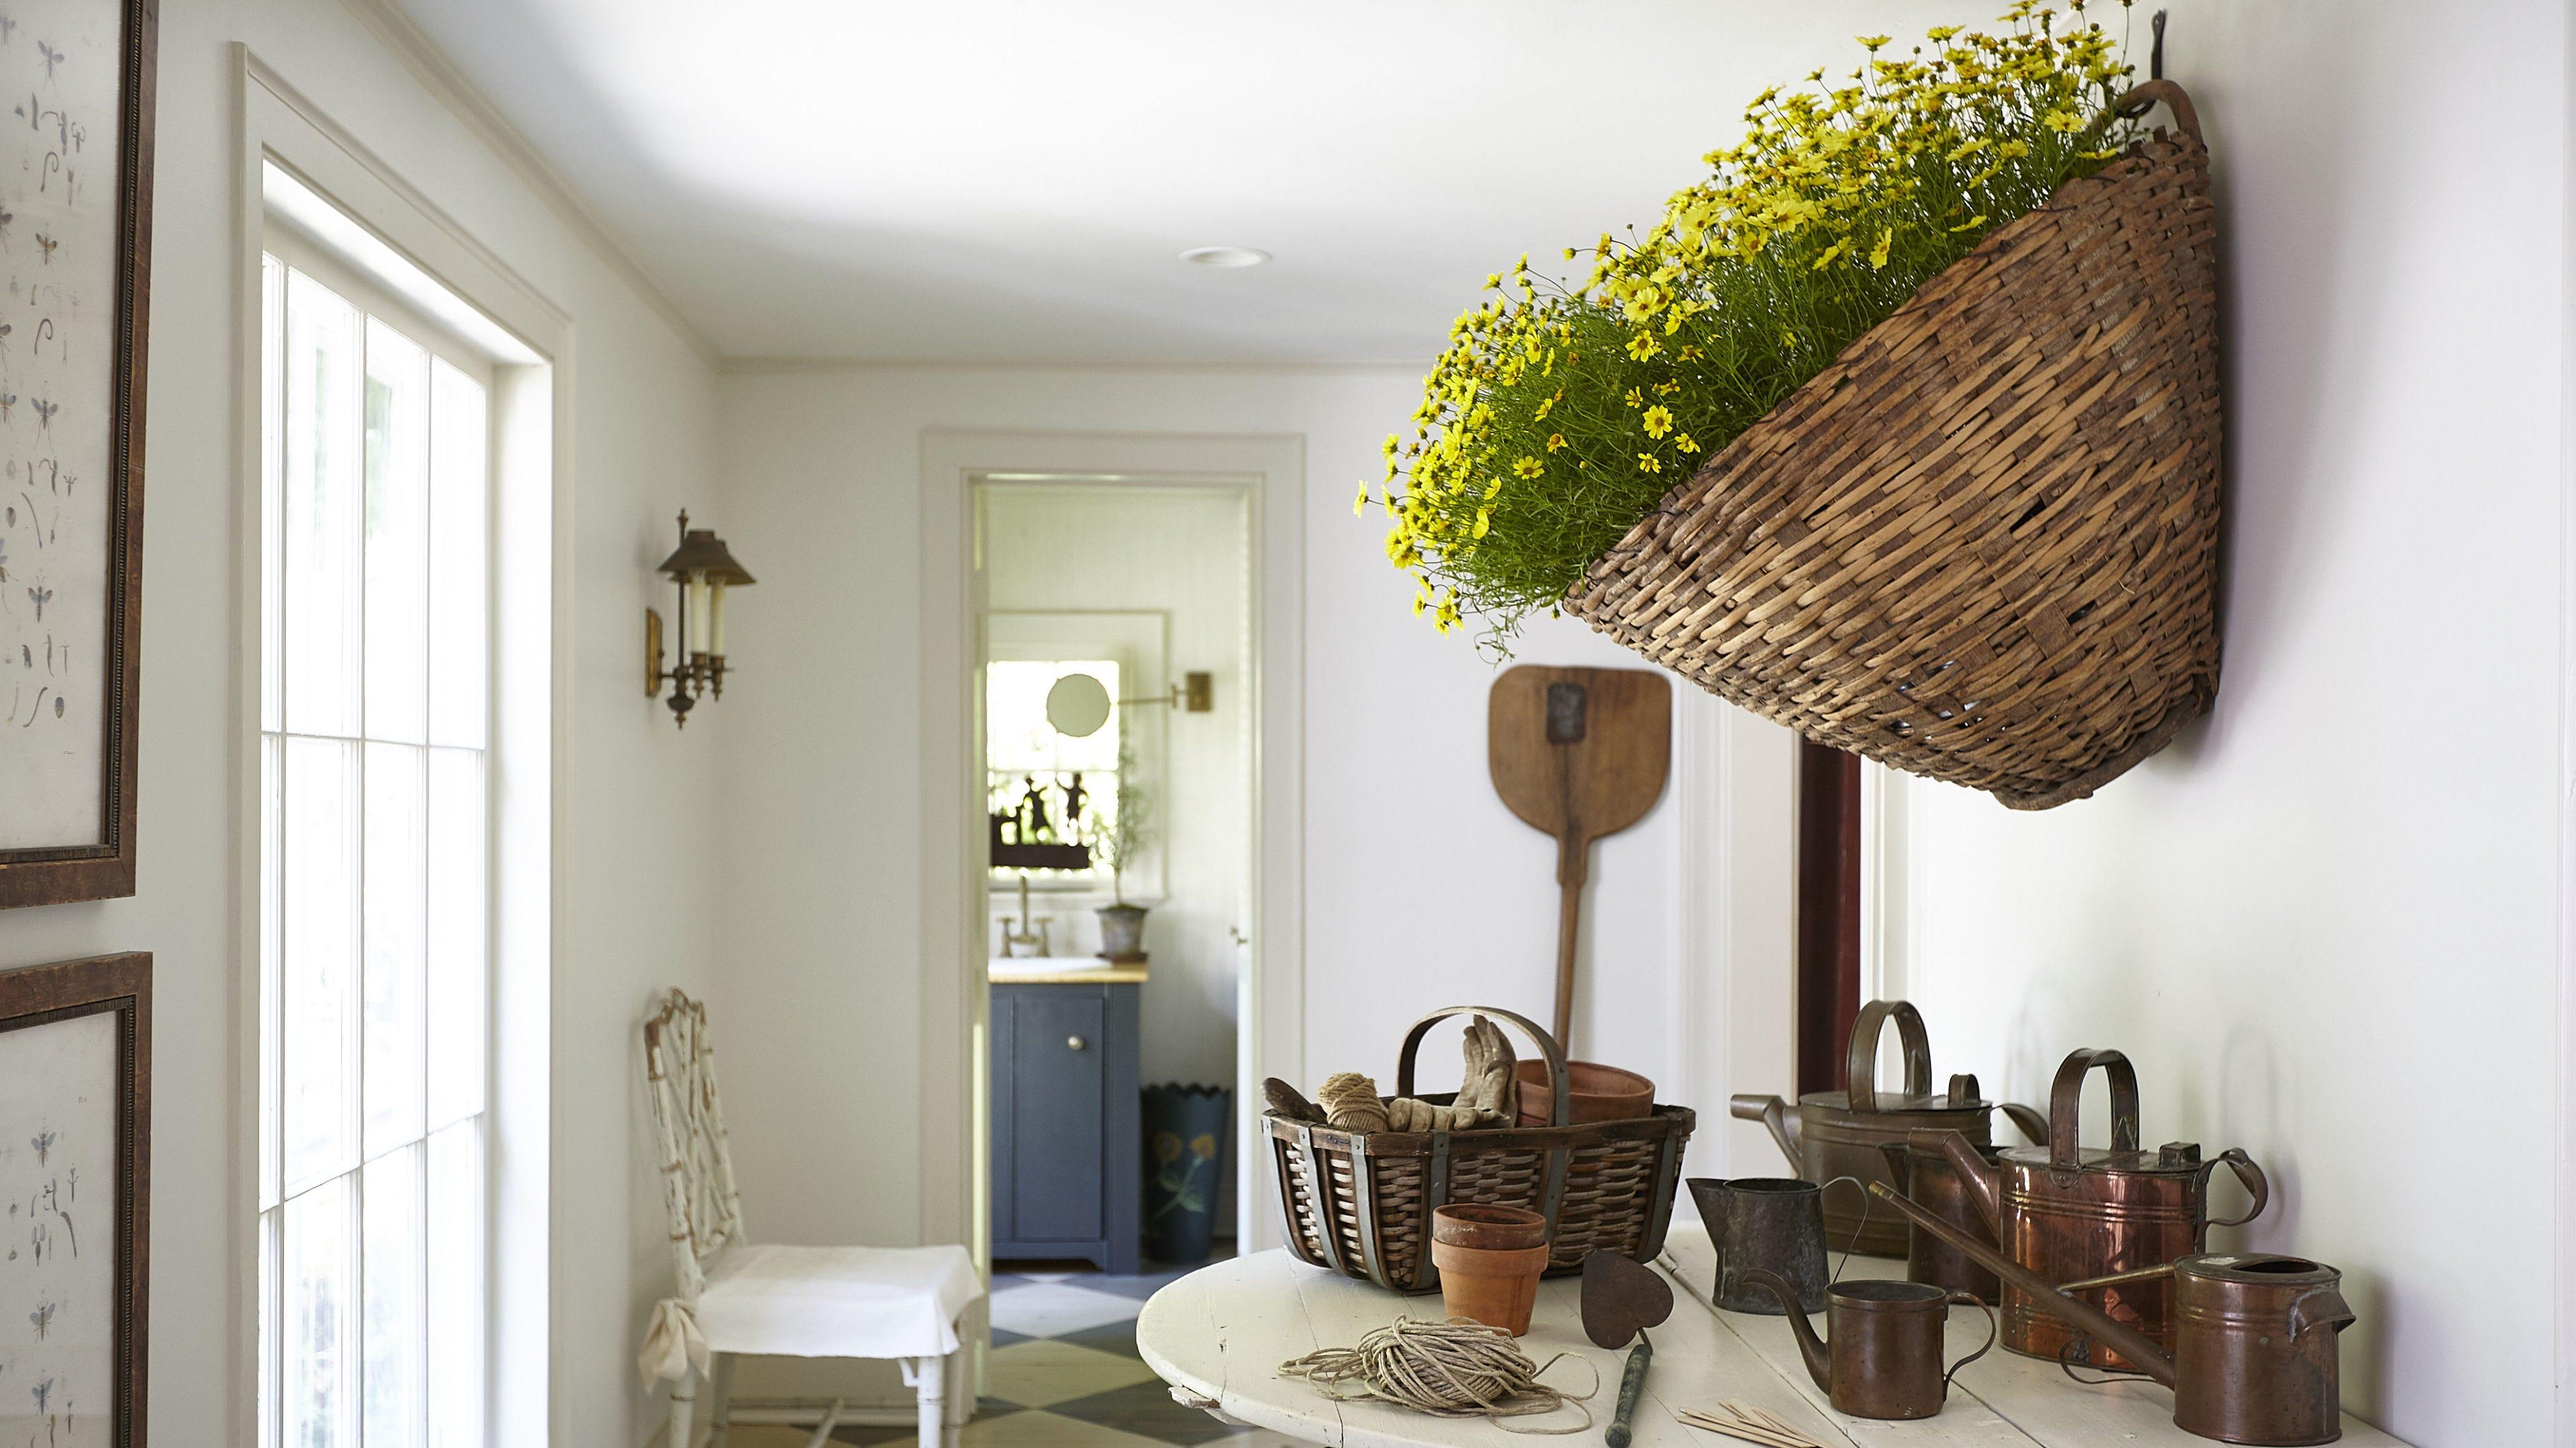 Room, Interior design, Floor, Furniture, Flooring, Interior design, Ceiling, House, Door, Fixture,